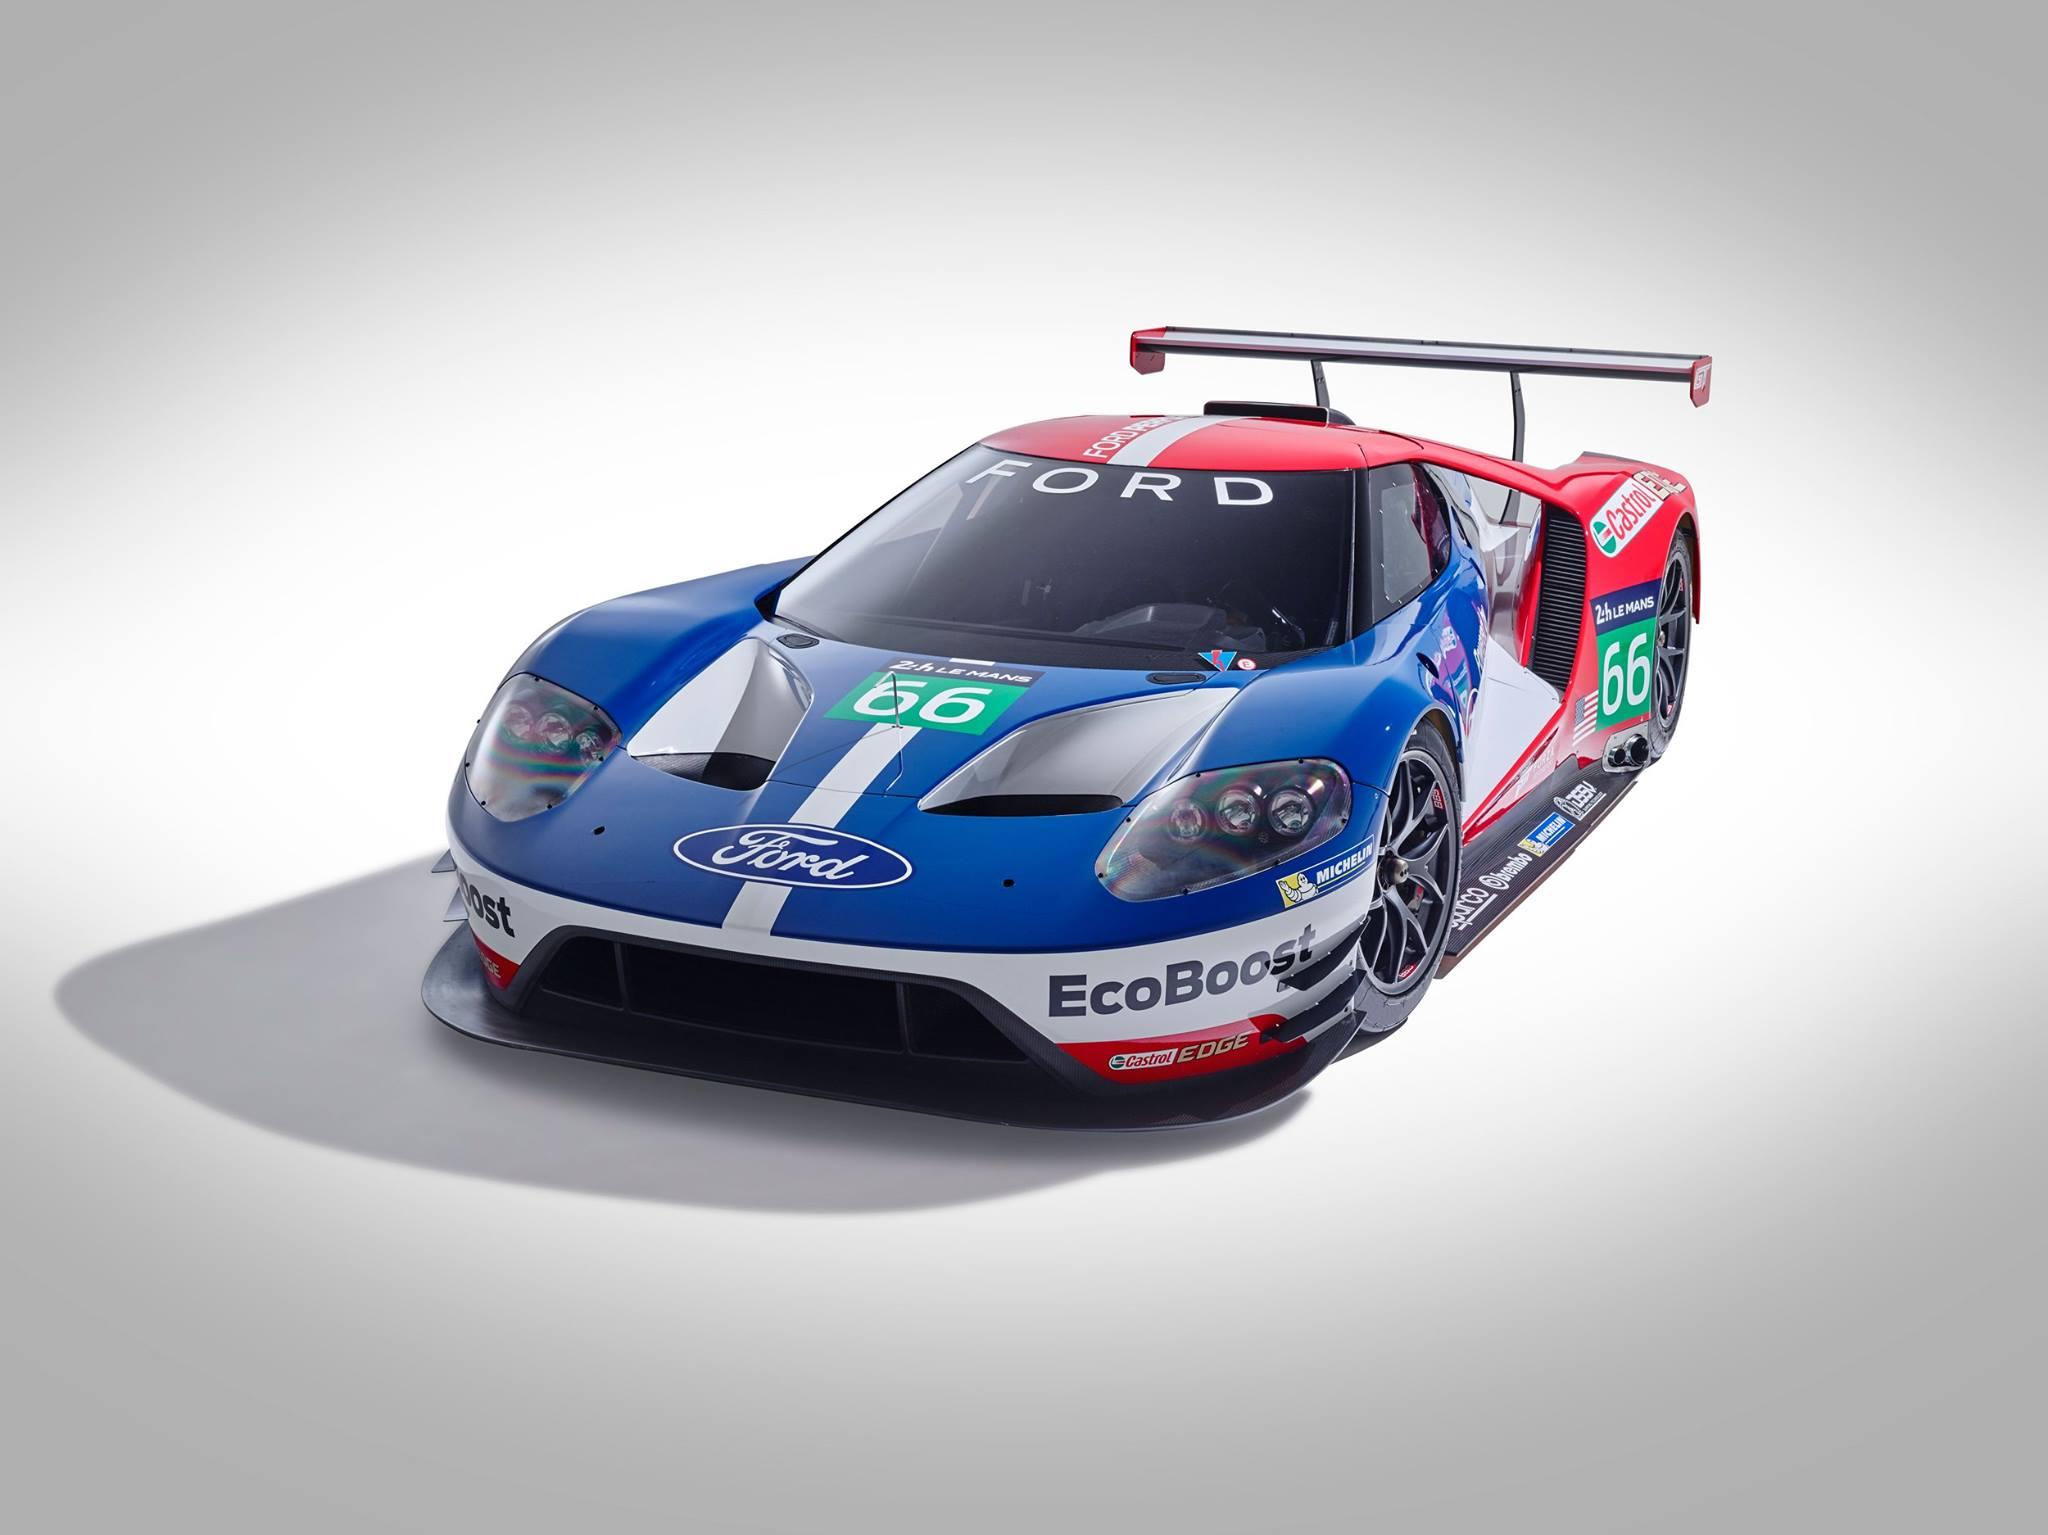 Speaking To Top Gear Magazine Forza Motorsport  Creative Director